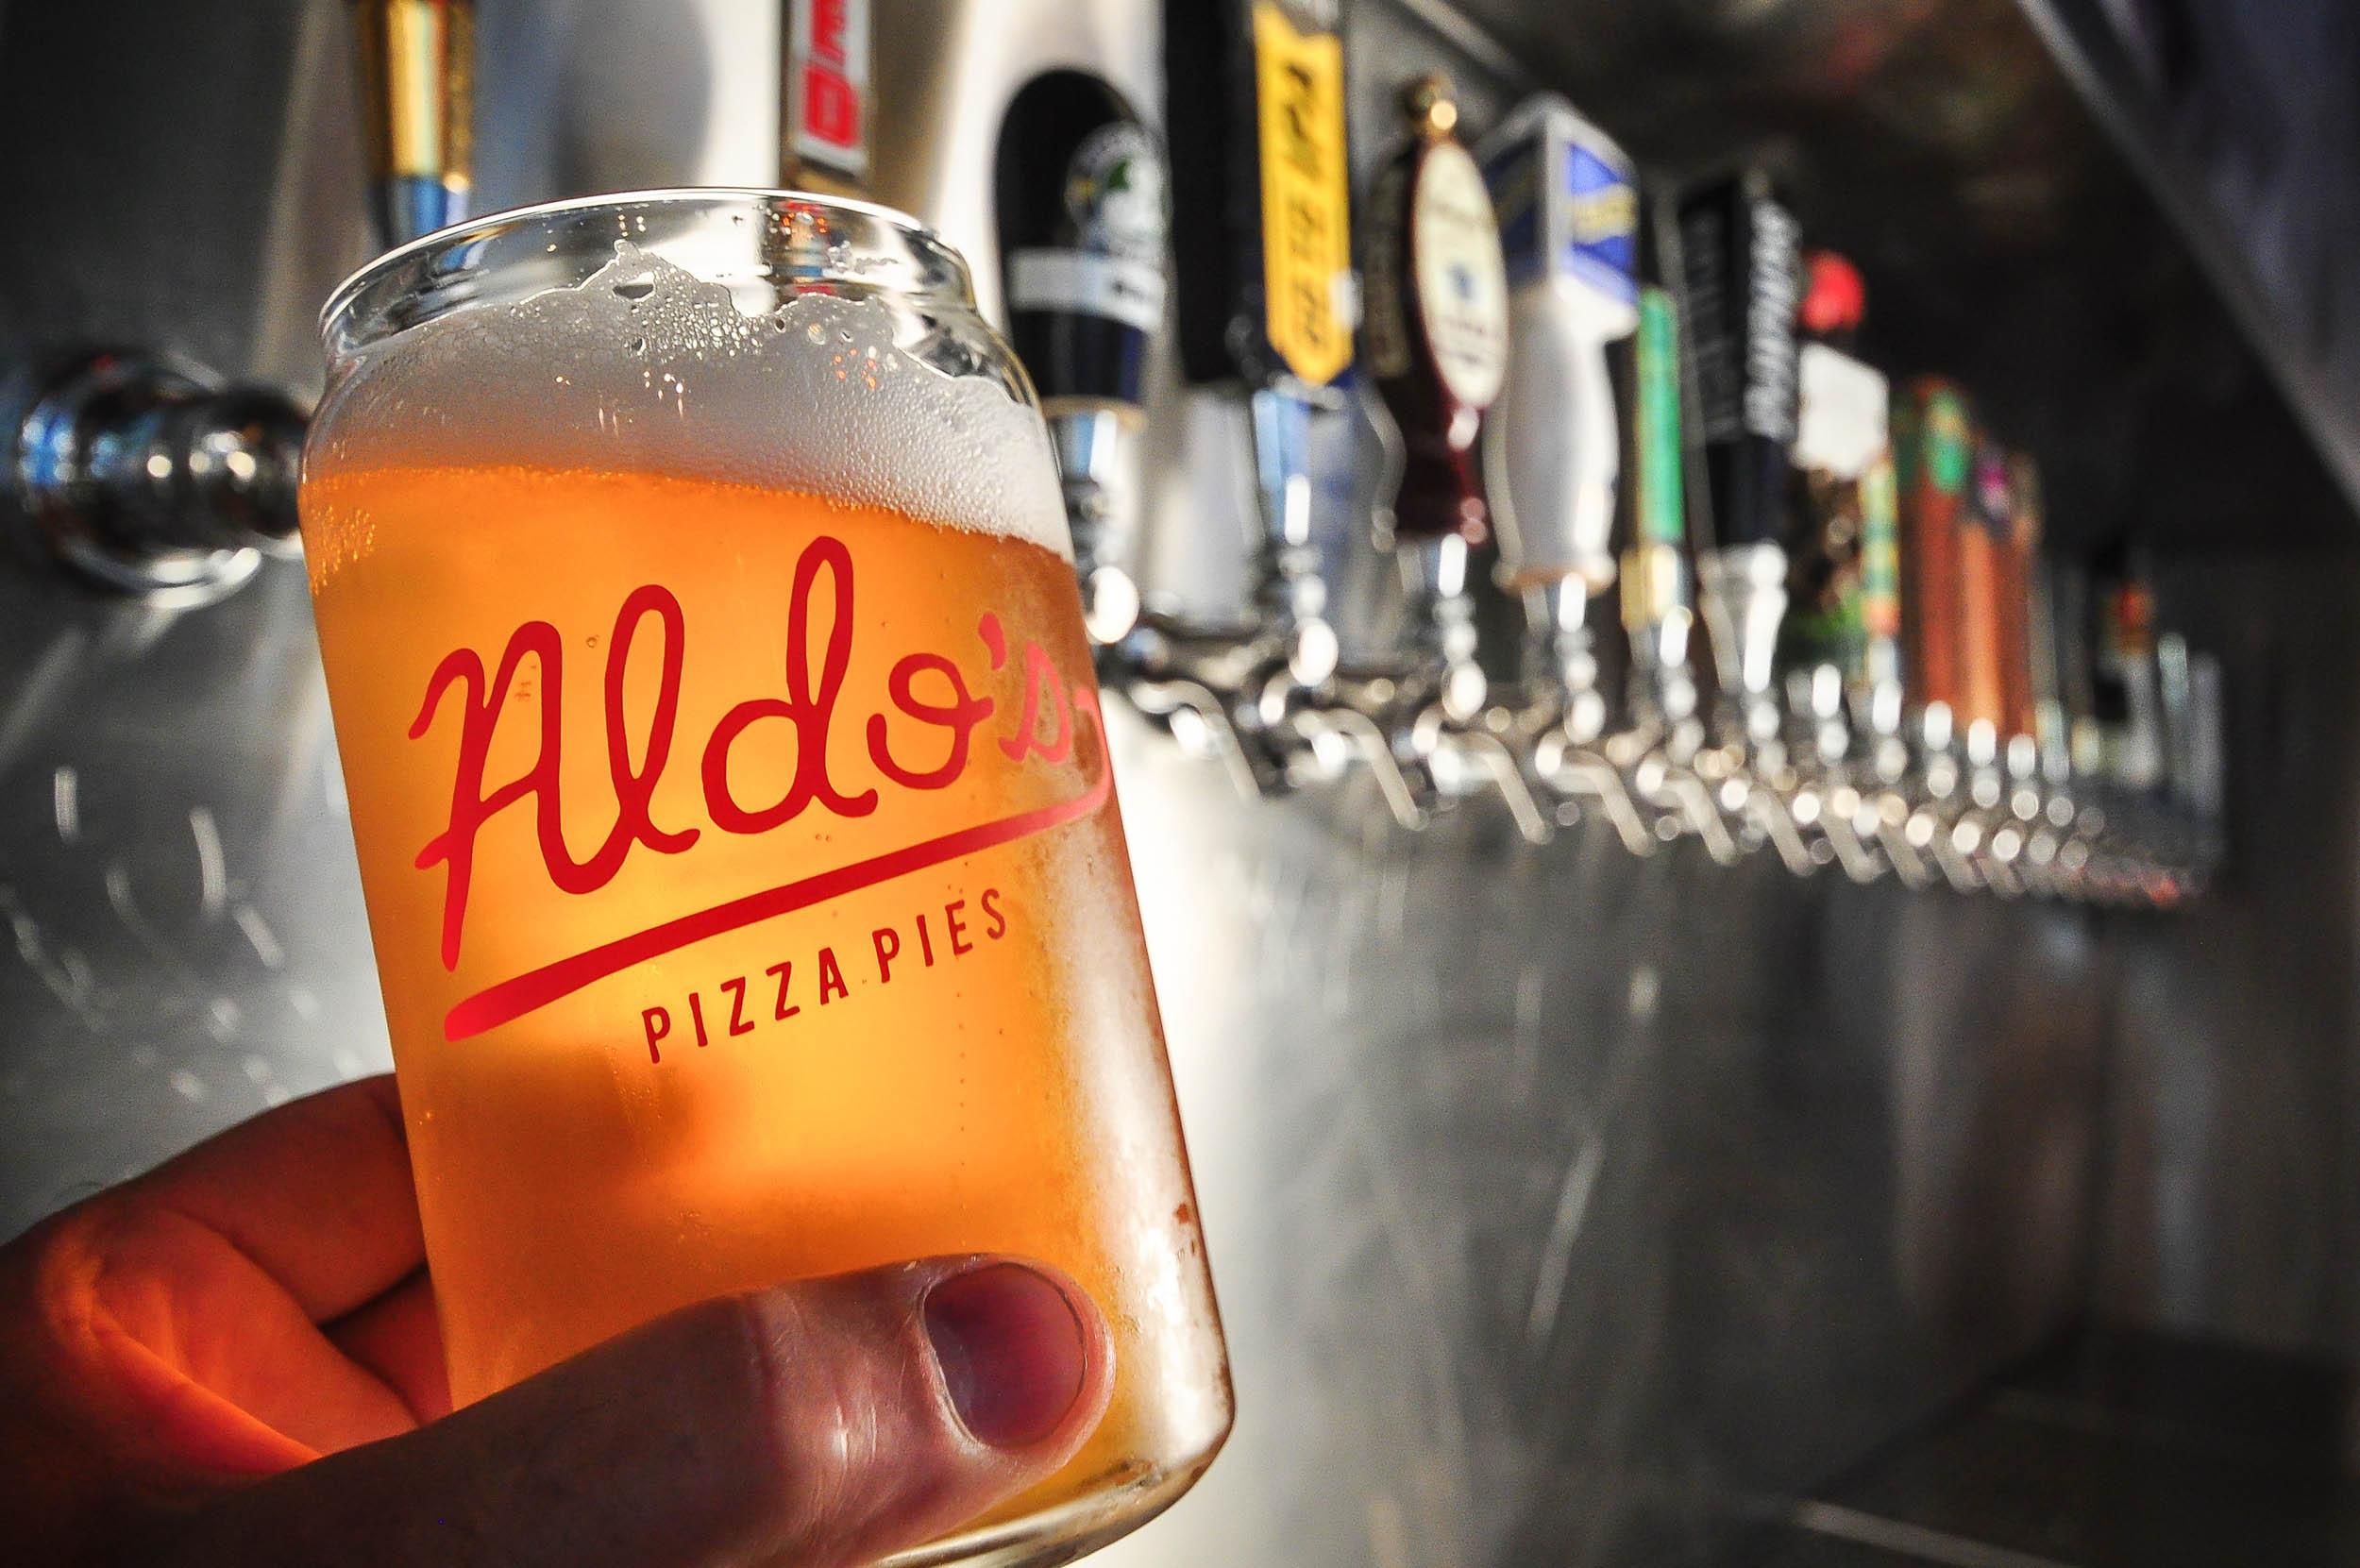 Aldos Pizza Pies 0177.jpg